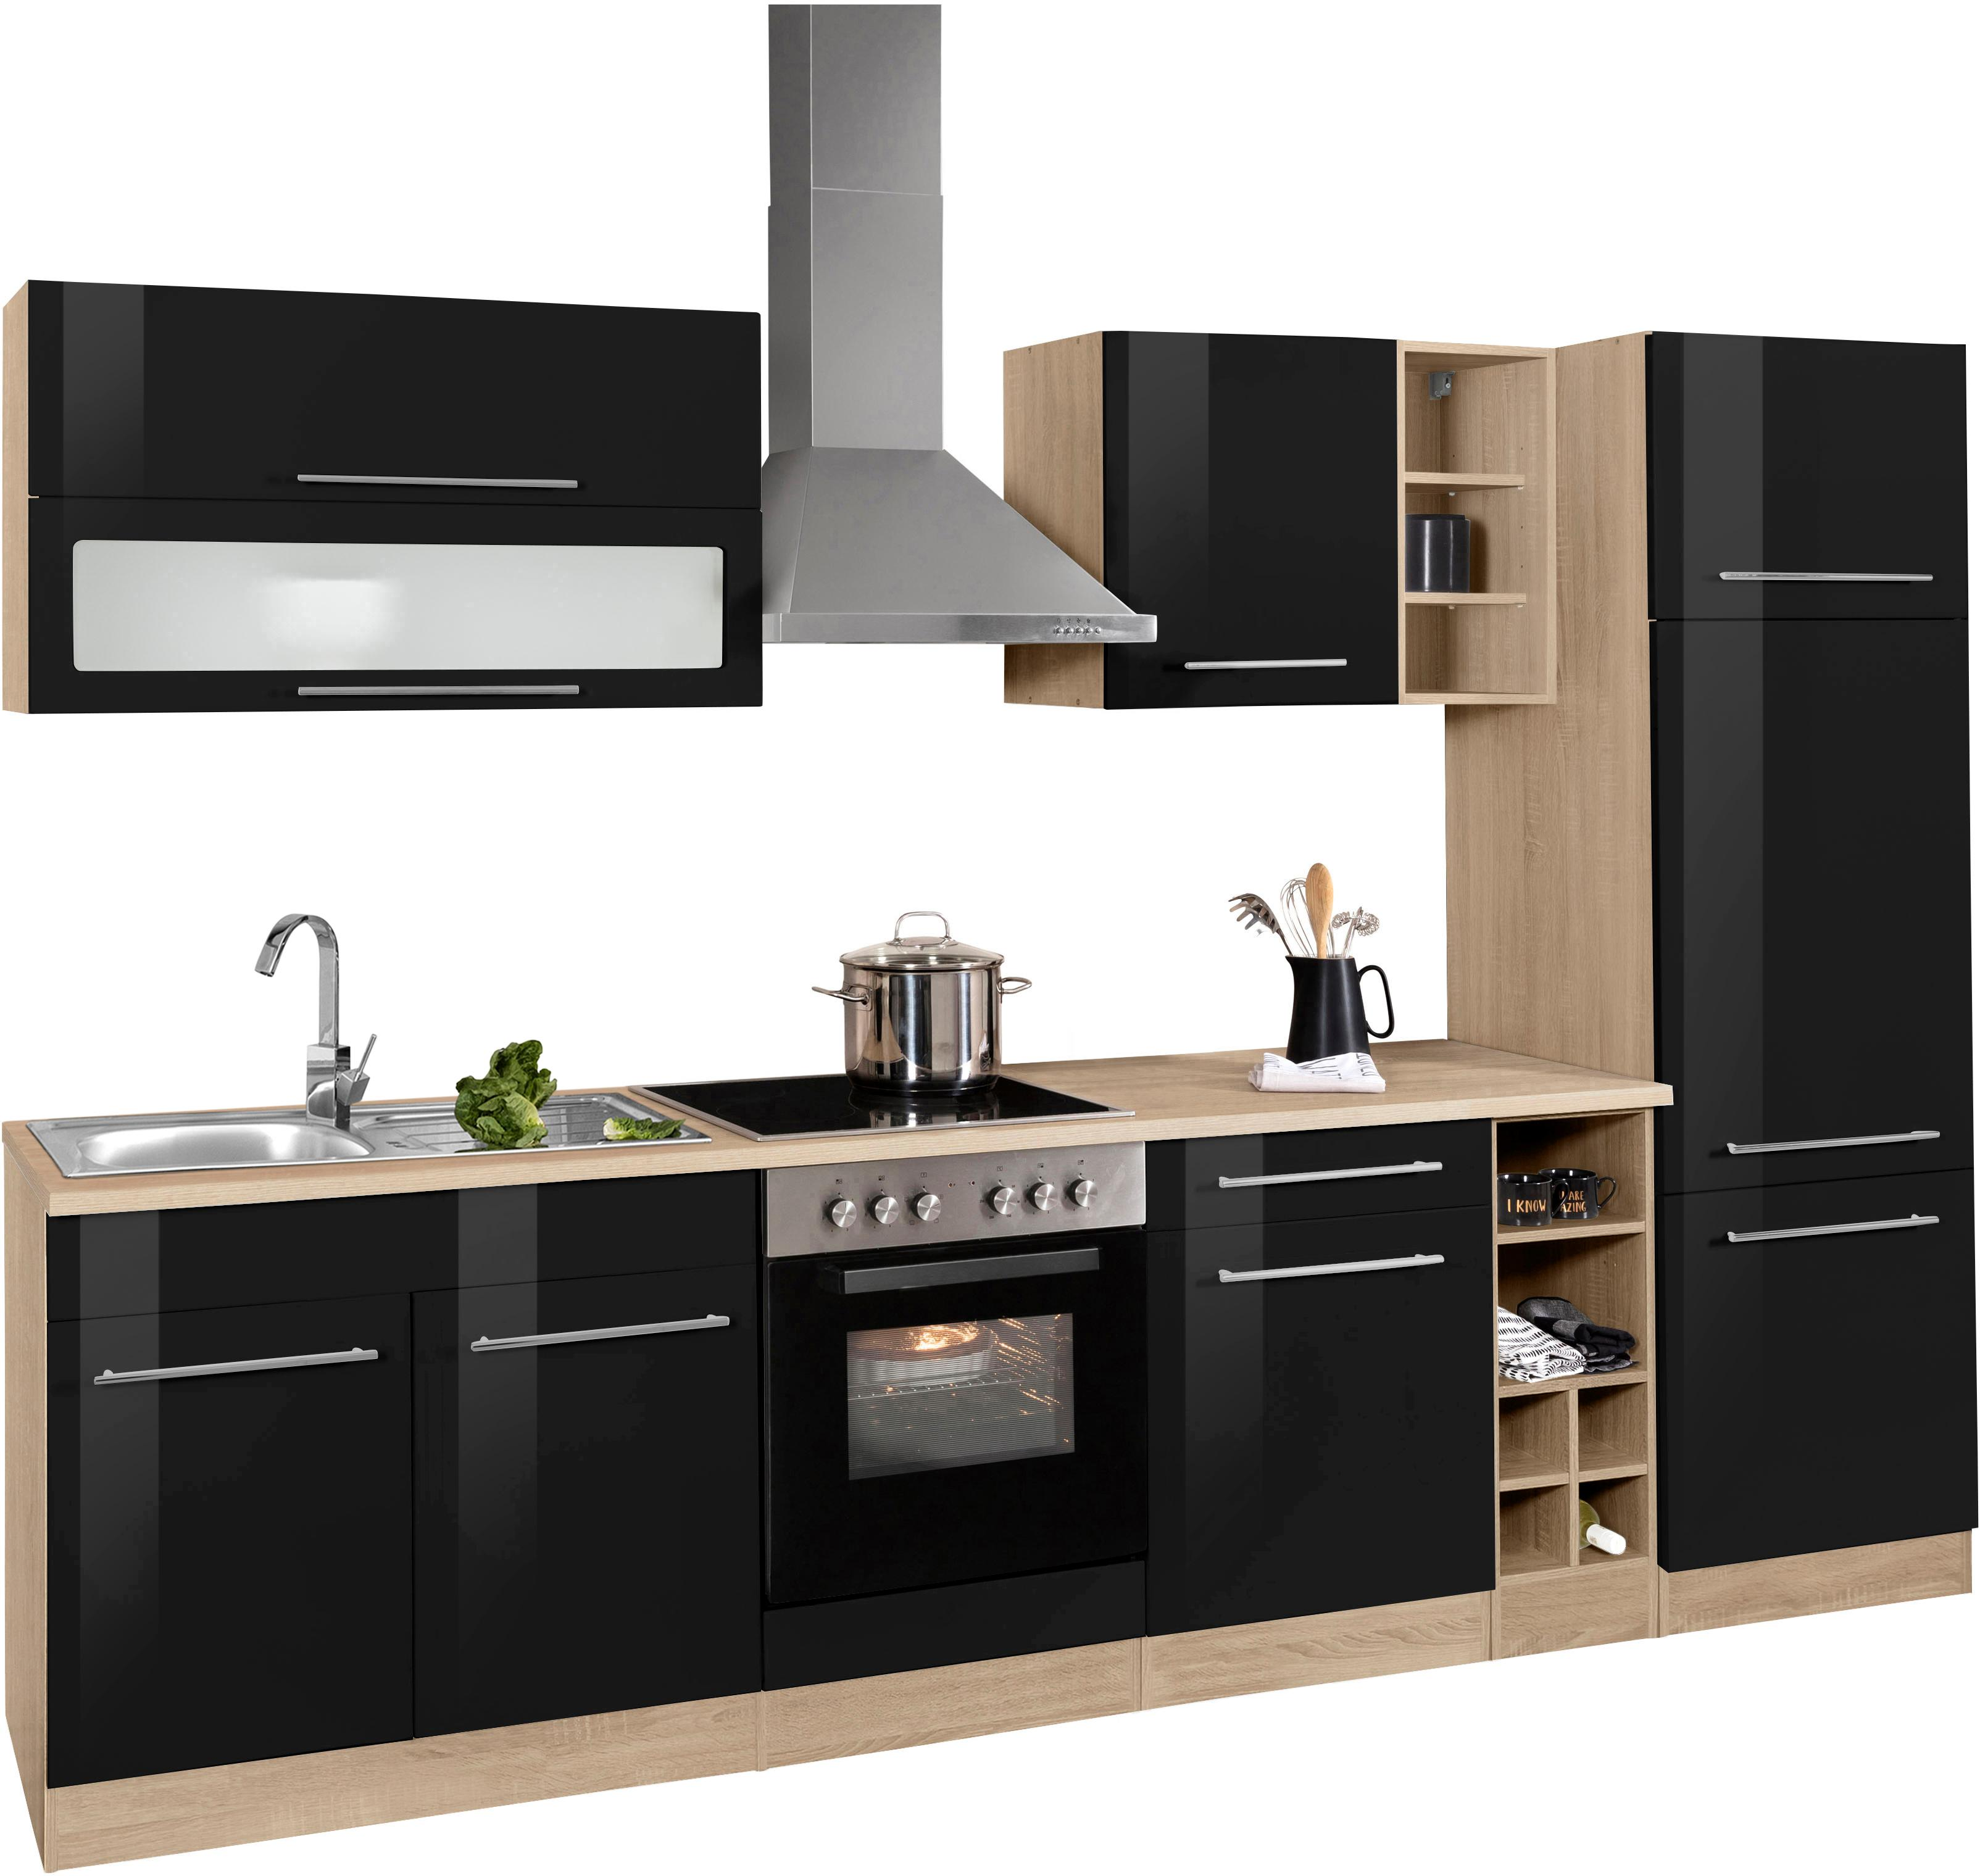 Kuche kaufen 300 cm for Gunstiger kuchenblock